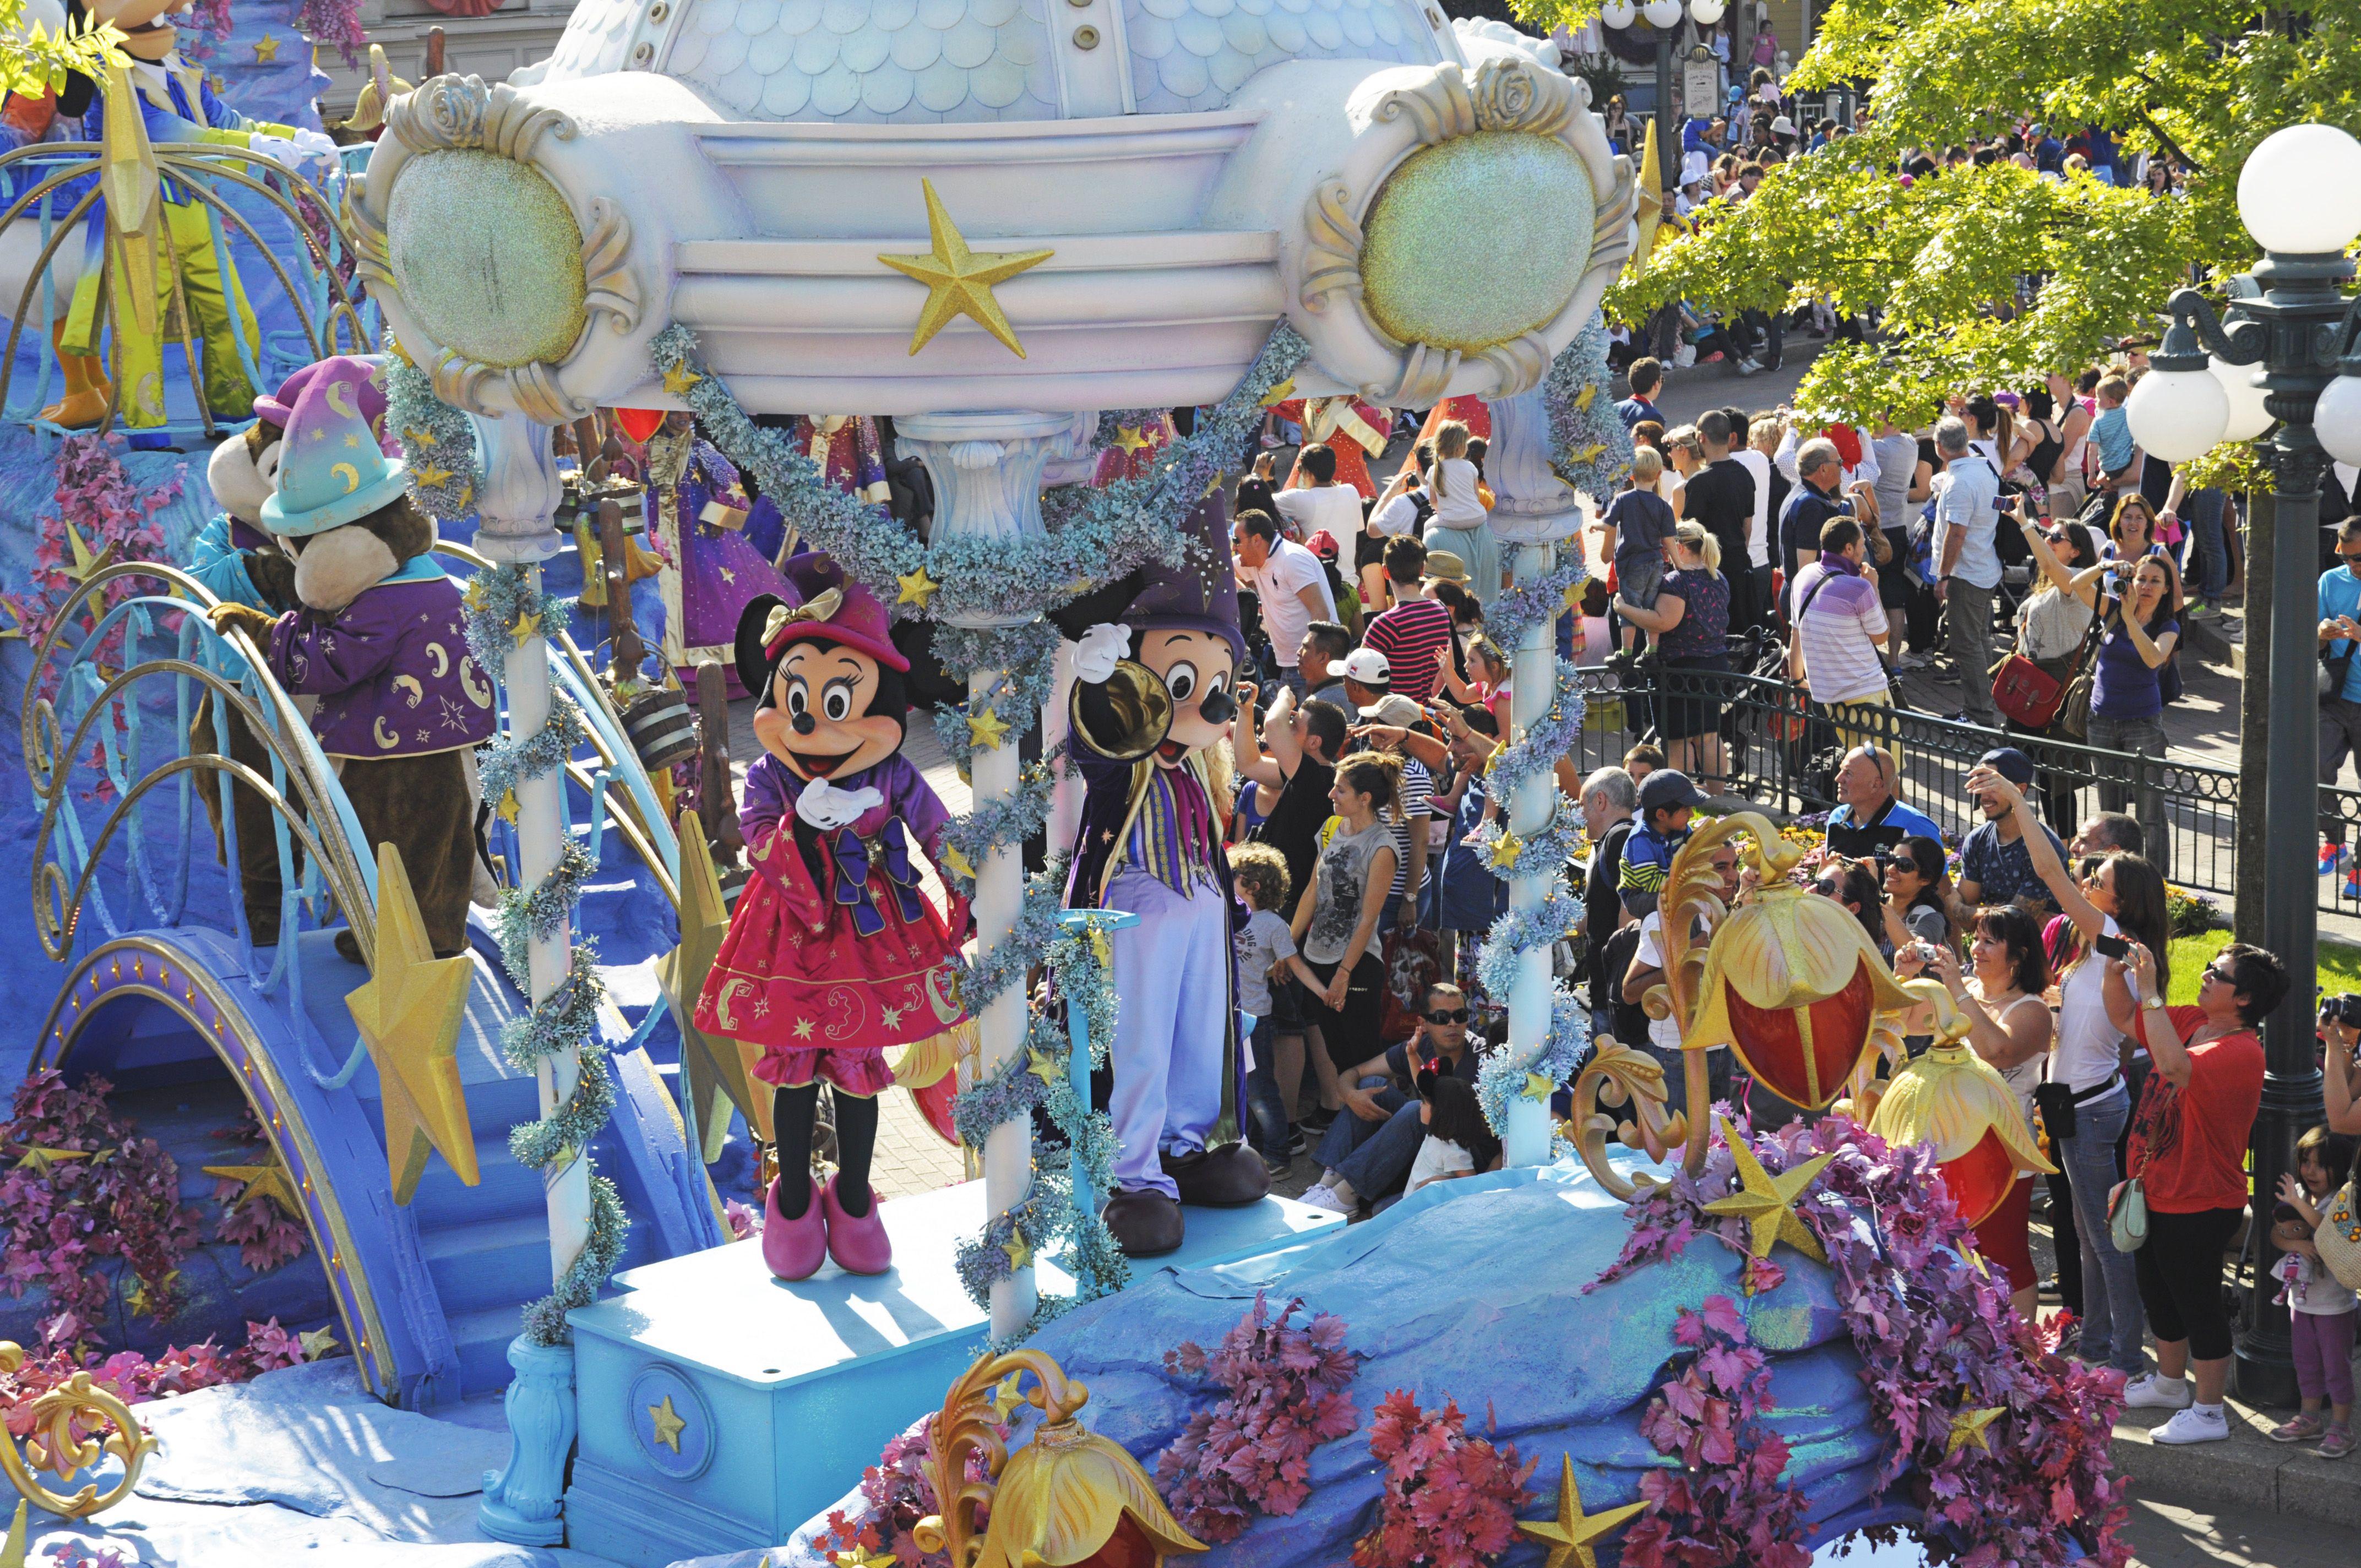 Disney Magic Parade Disneyland Paris Time